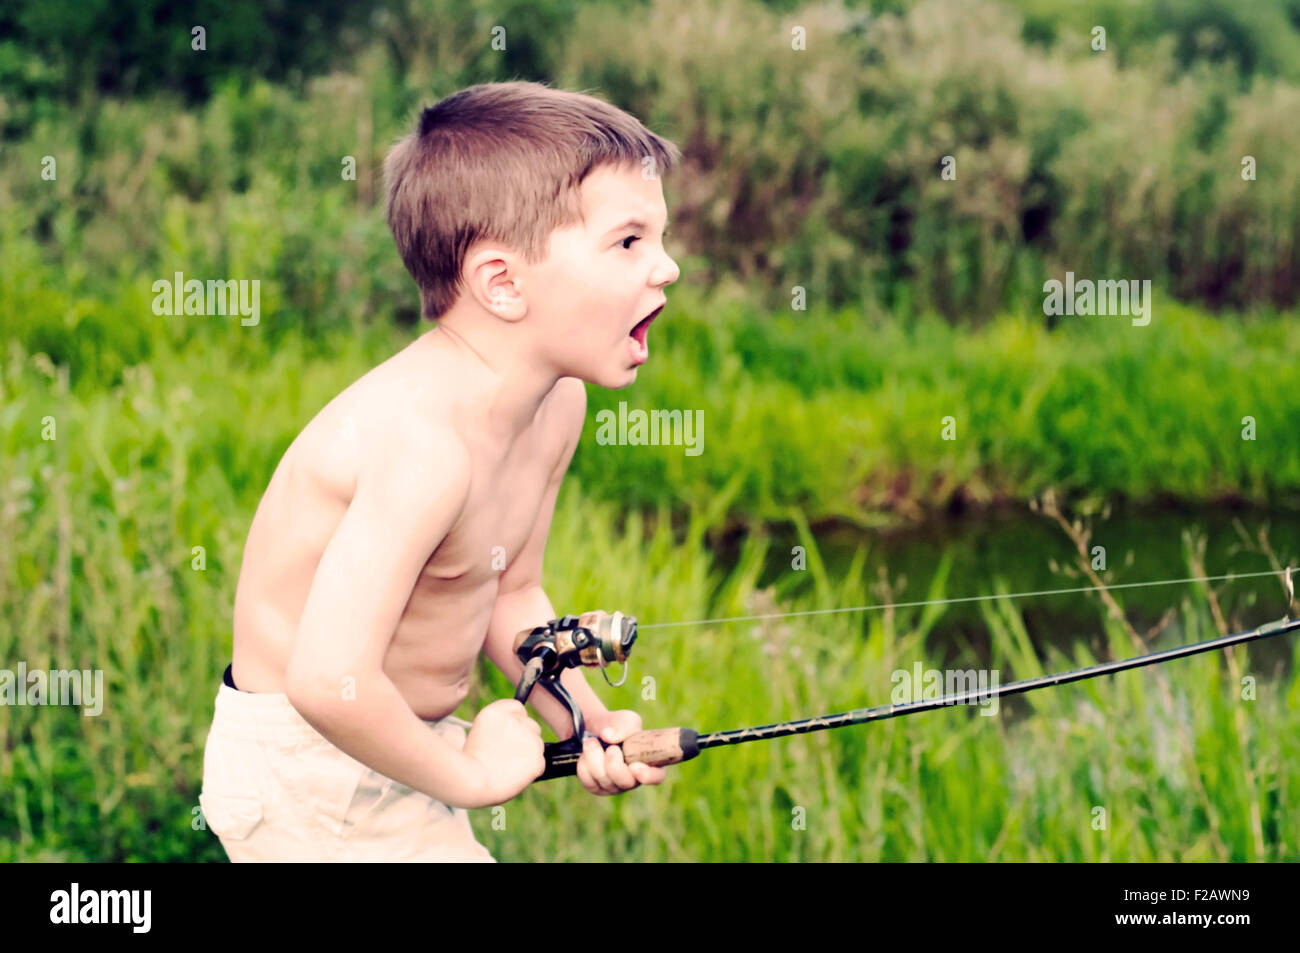 Leidenschaftliche Angler-Boy Angeln Stockbild